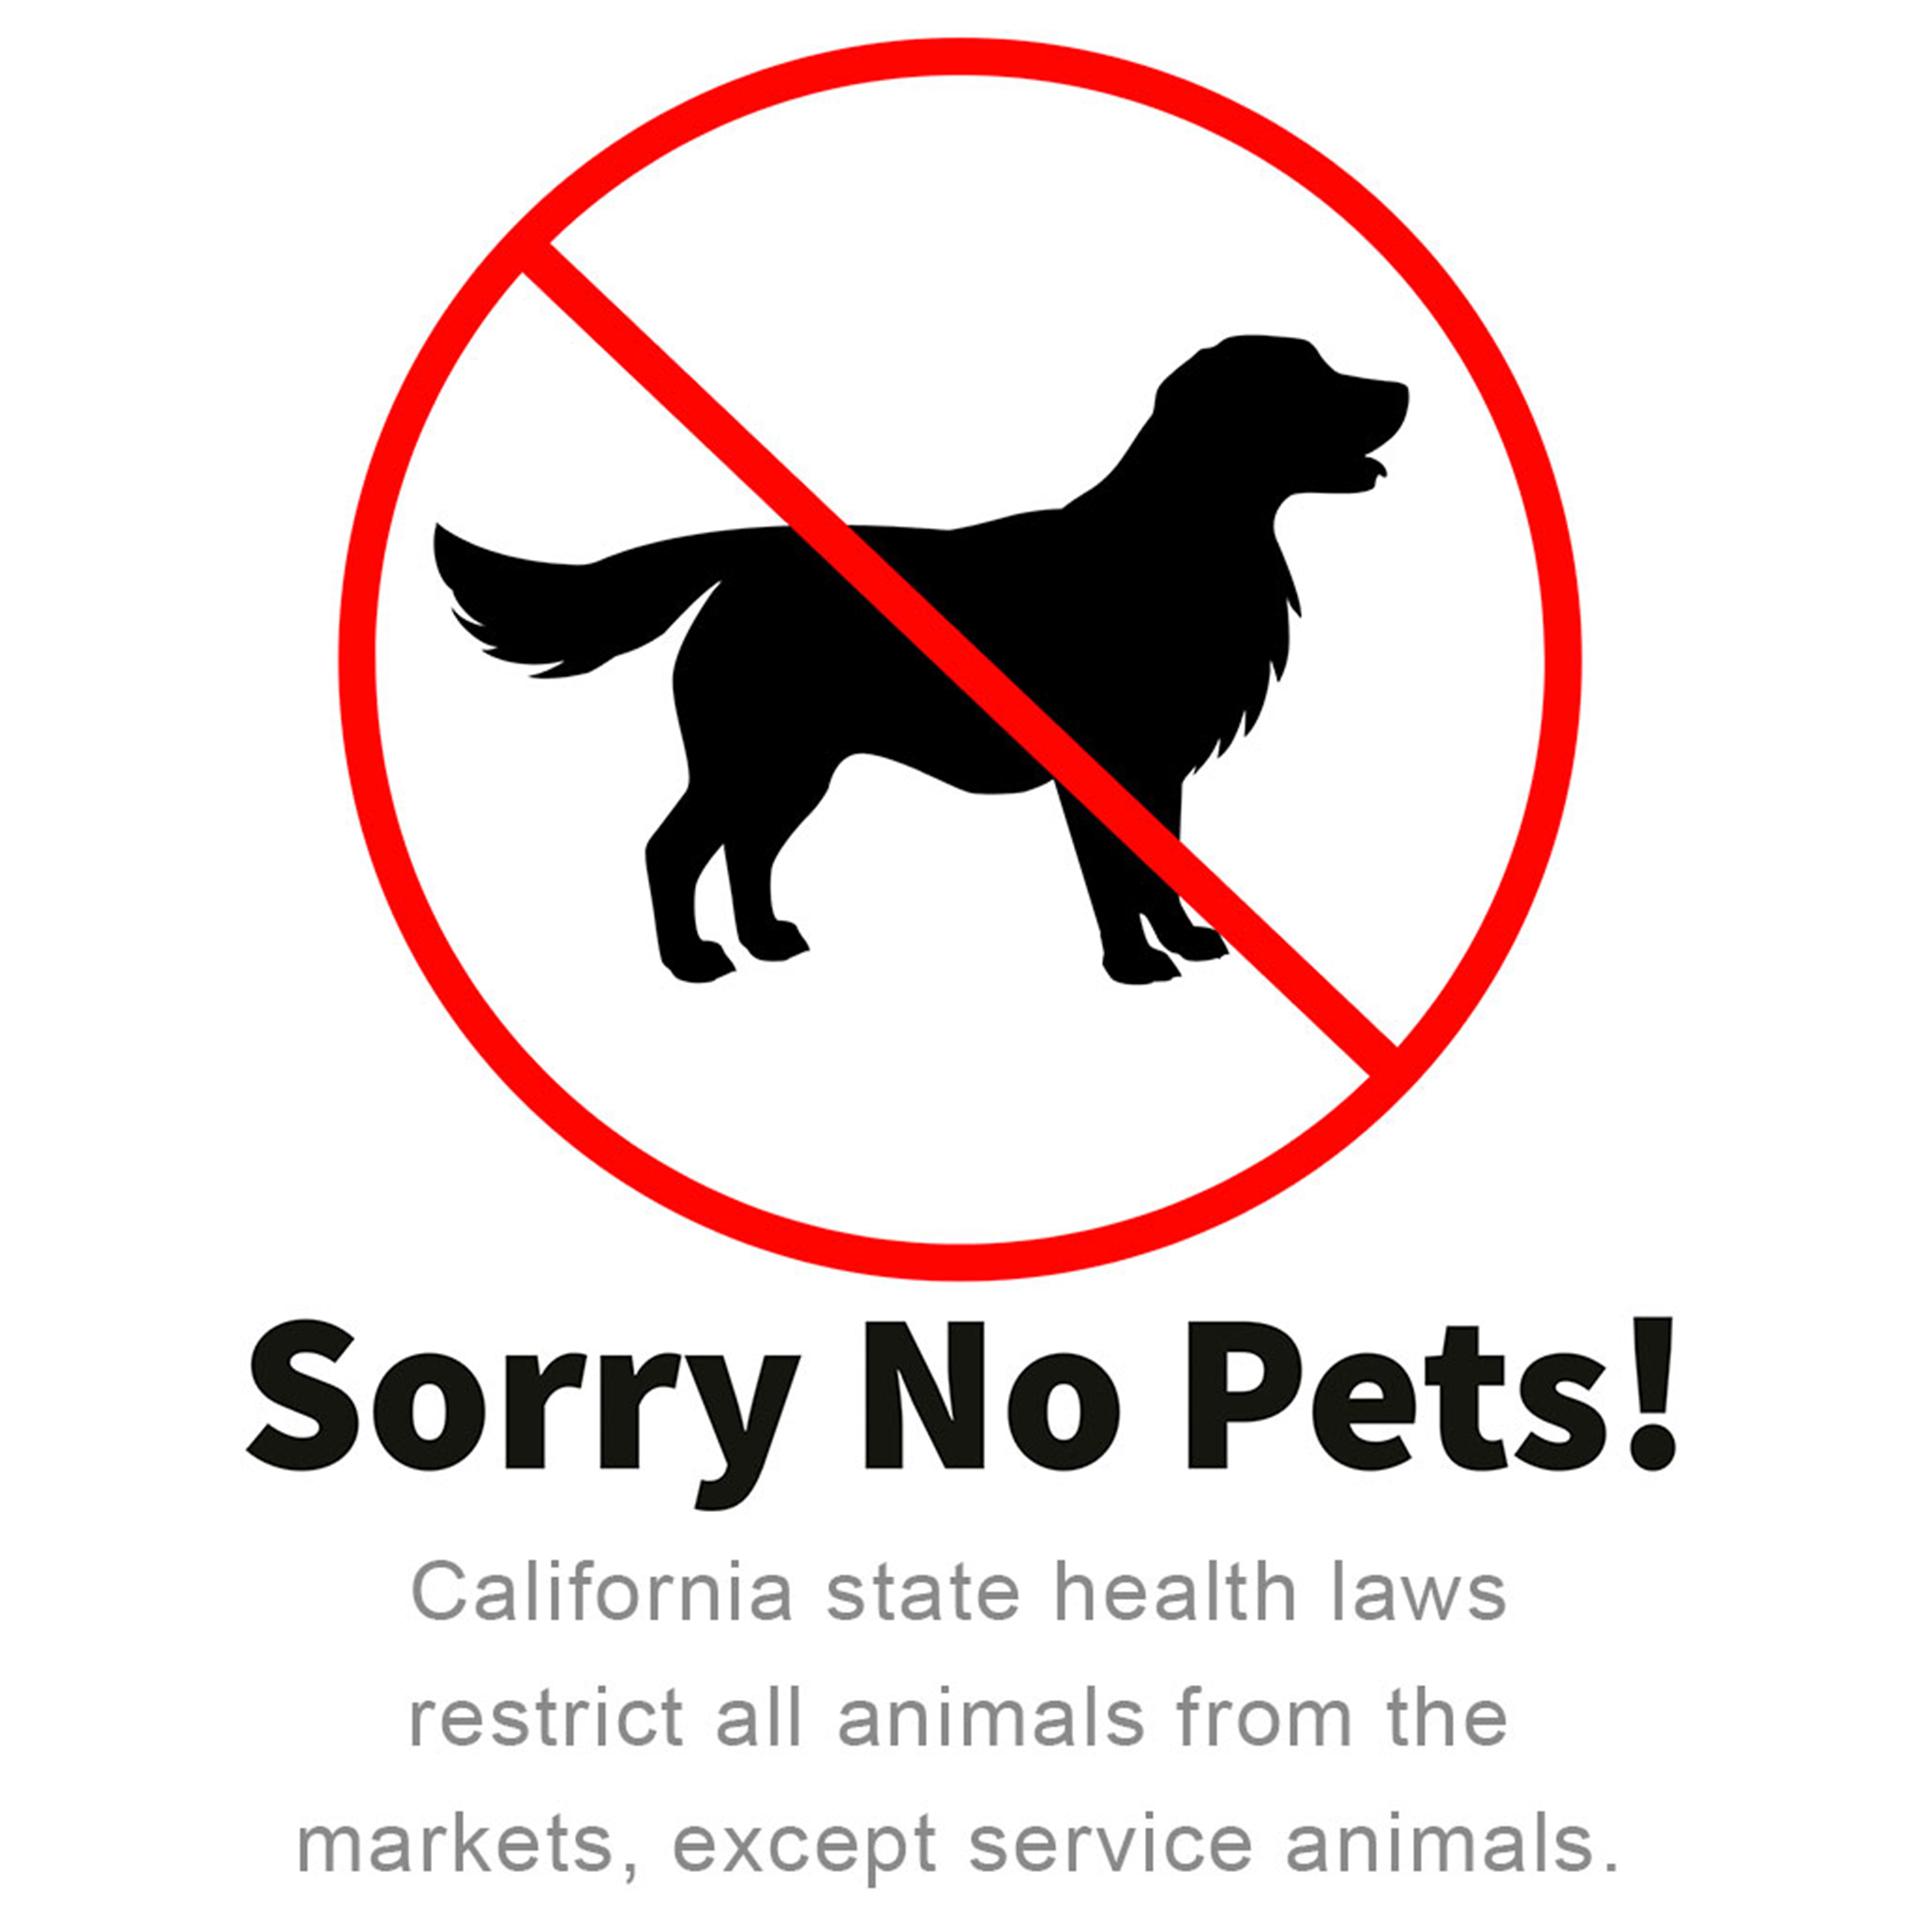 sorry-no-pets.jpg